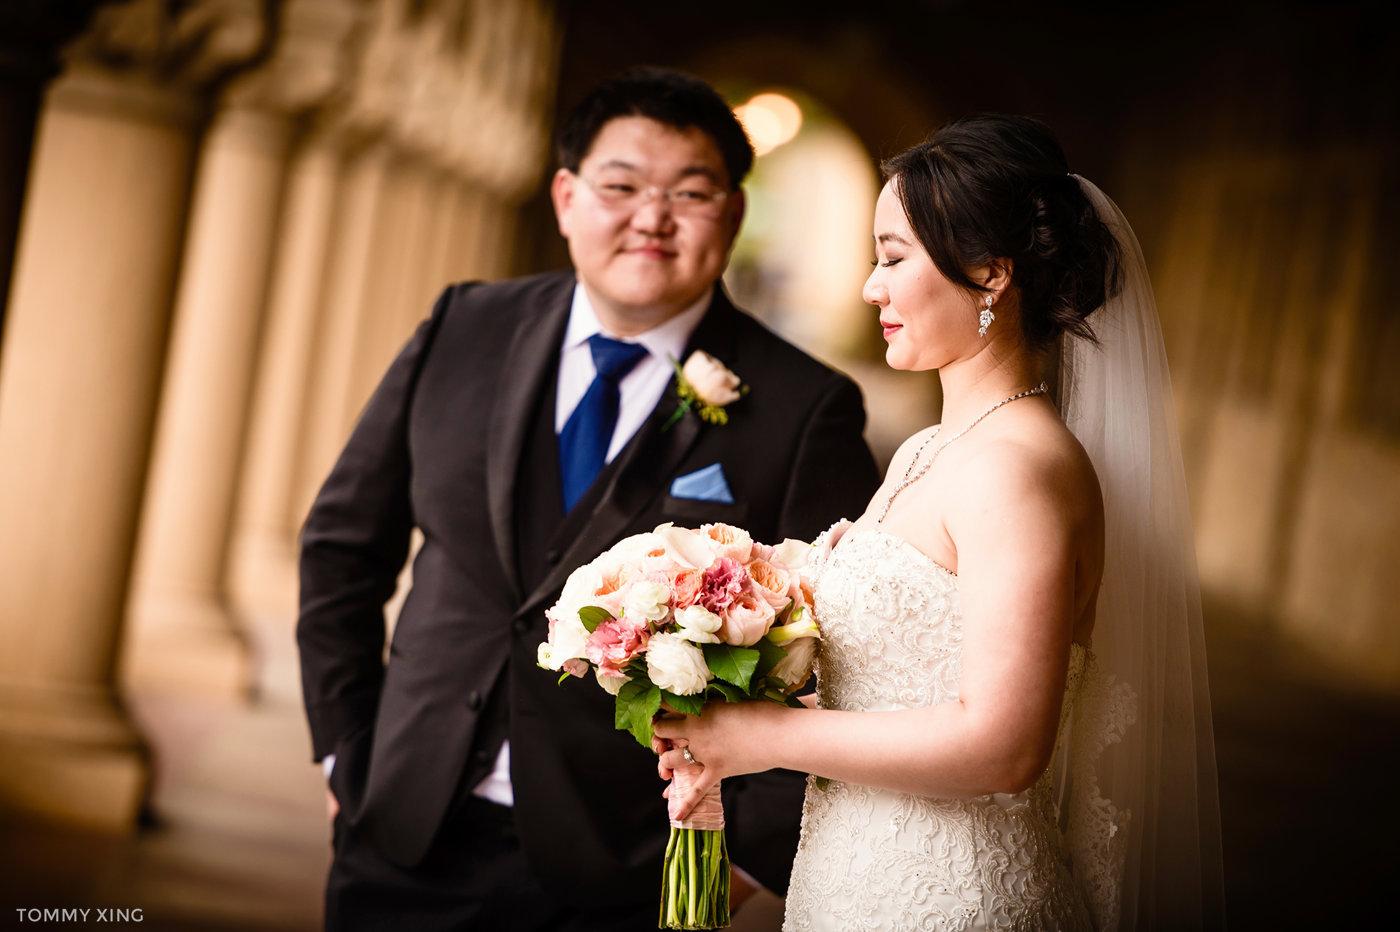 STANFORD MEMORIAL CHURCH WEDDING - Wenjie & Chengcheng - SAN FRANCISCO BAY AREA 斯坦福教堂婚礼跟拍 - 洛杉矶婚礼婚纱照摄影师 Tommy Xing Photography155.jpg